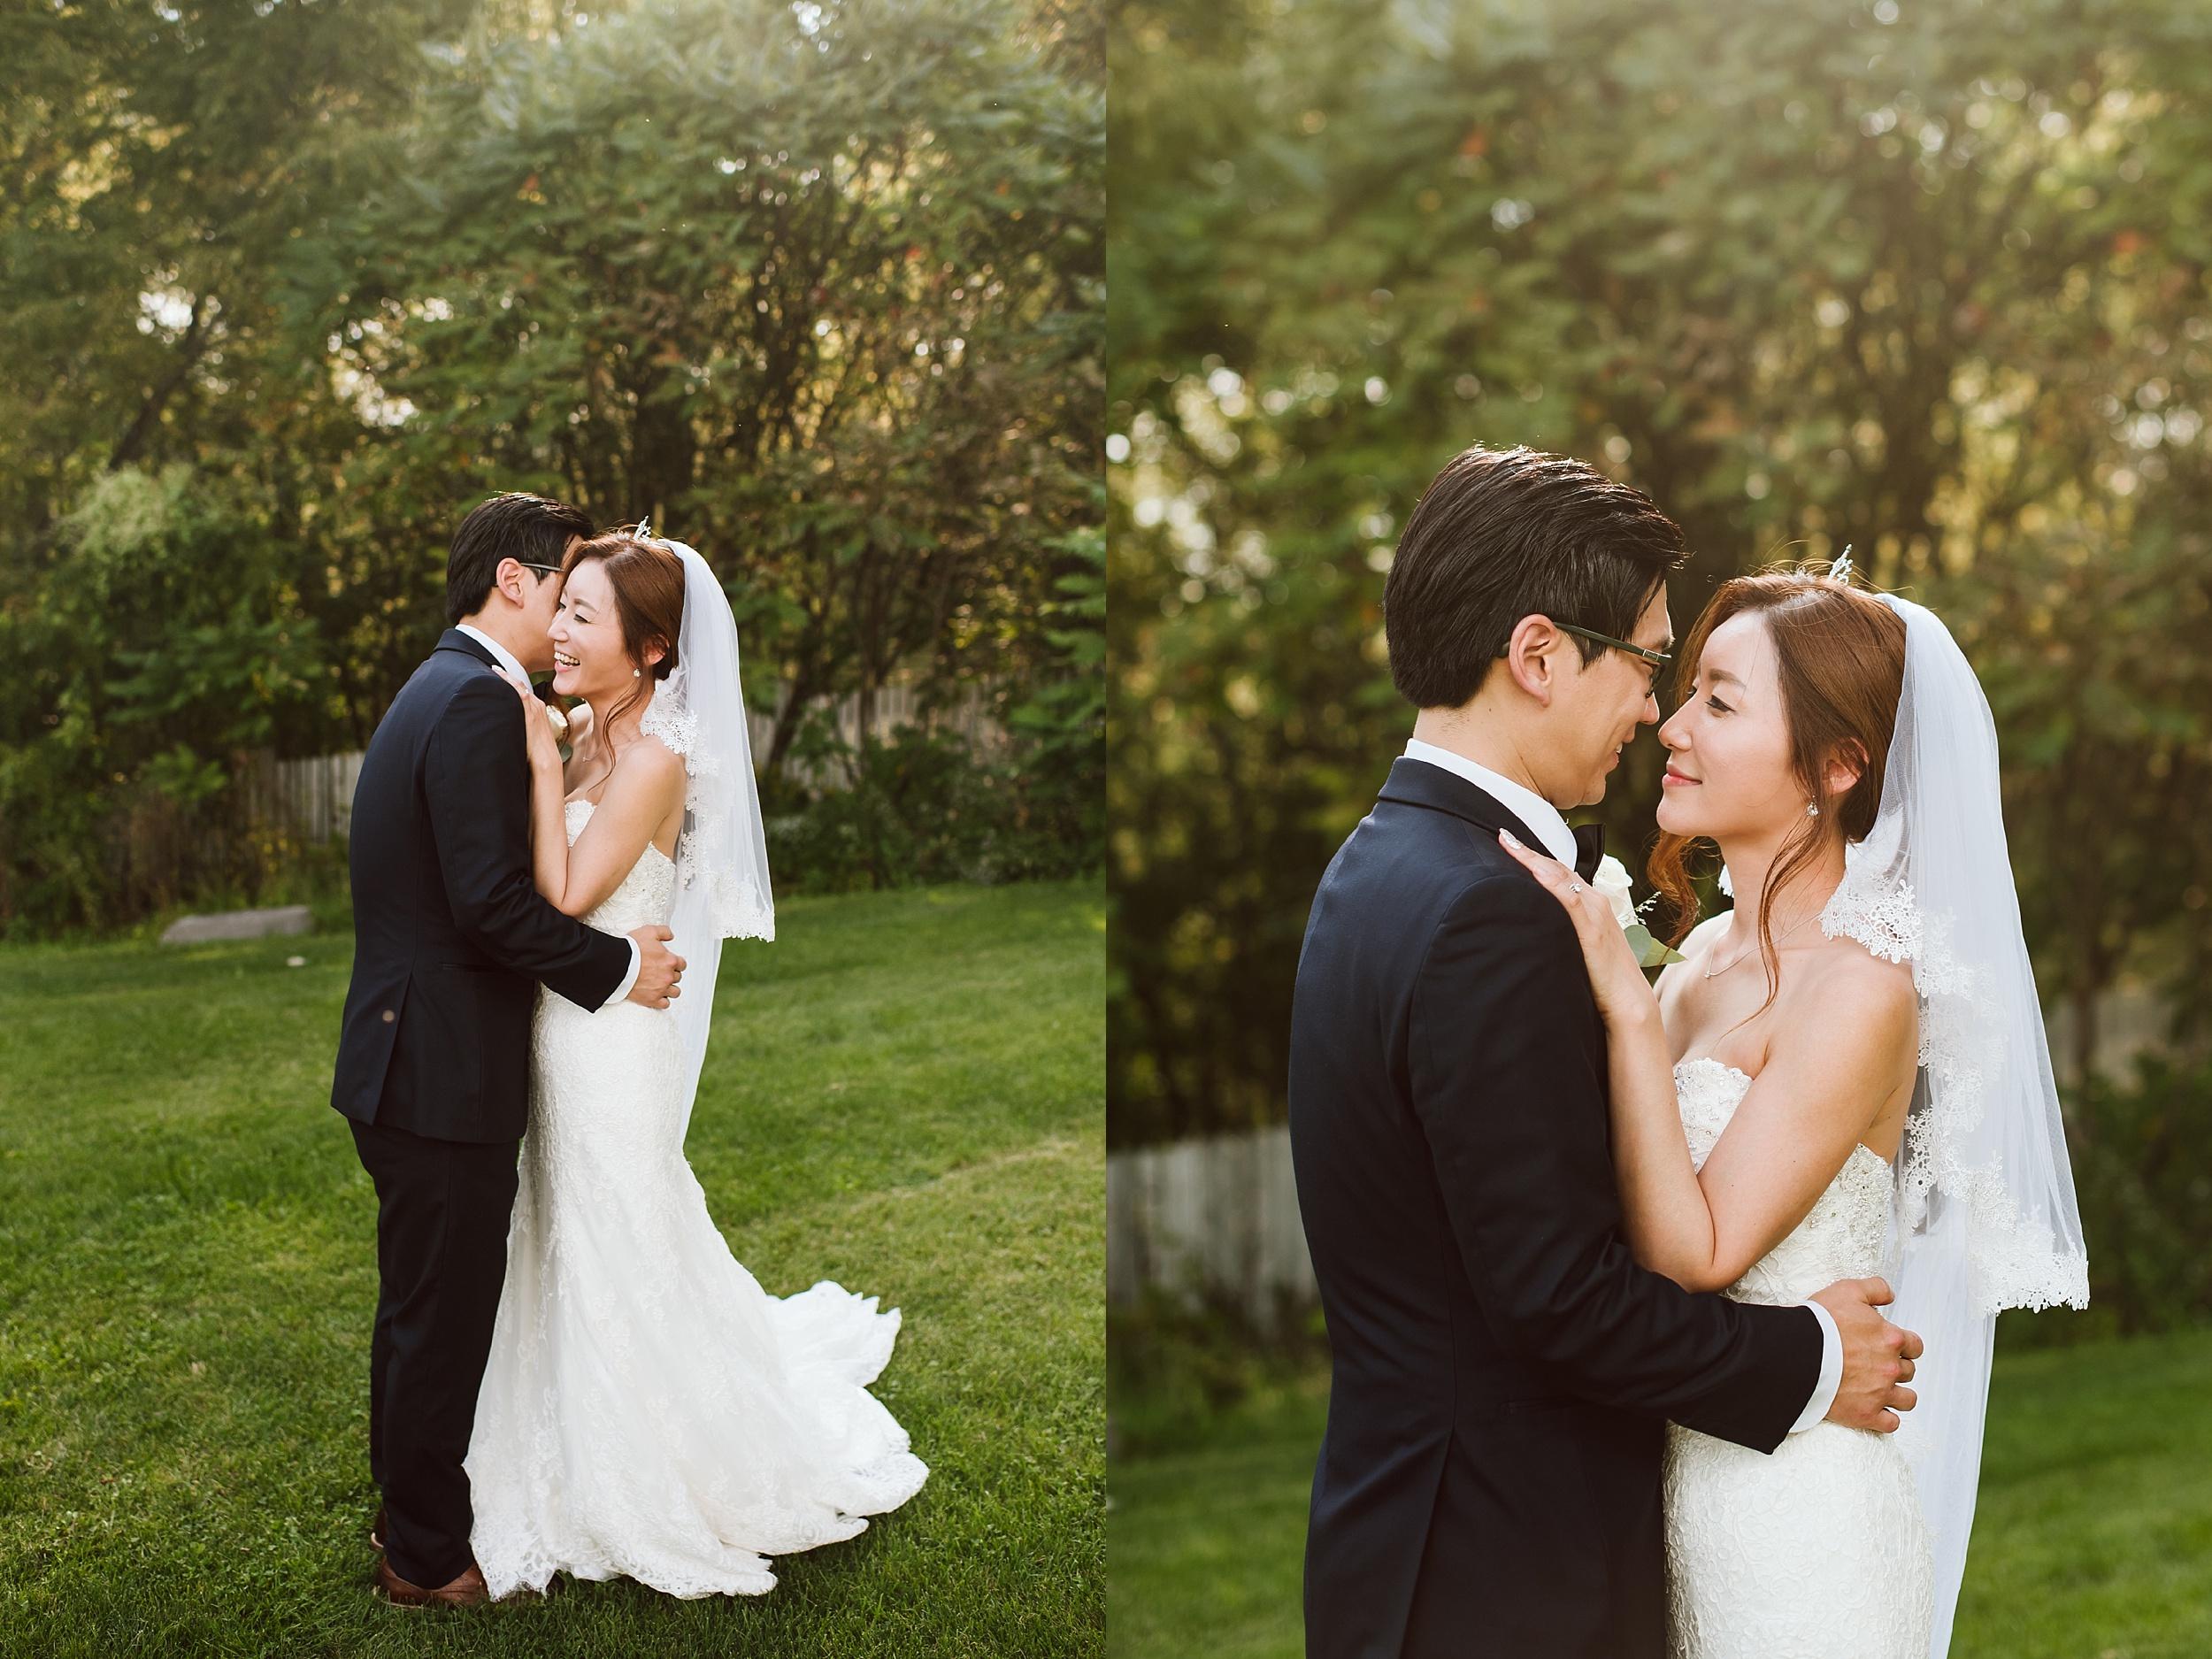 Doctors_House_Kleinburg_Wedding_Toronto_Photographer_0034.jpg